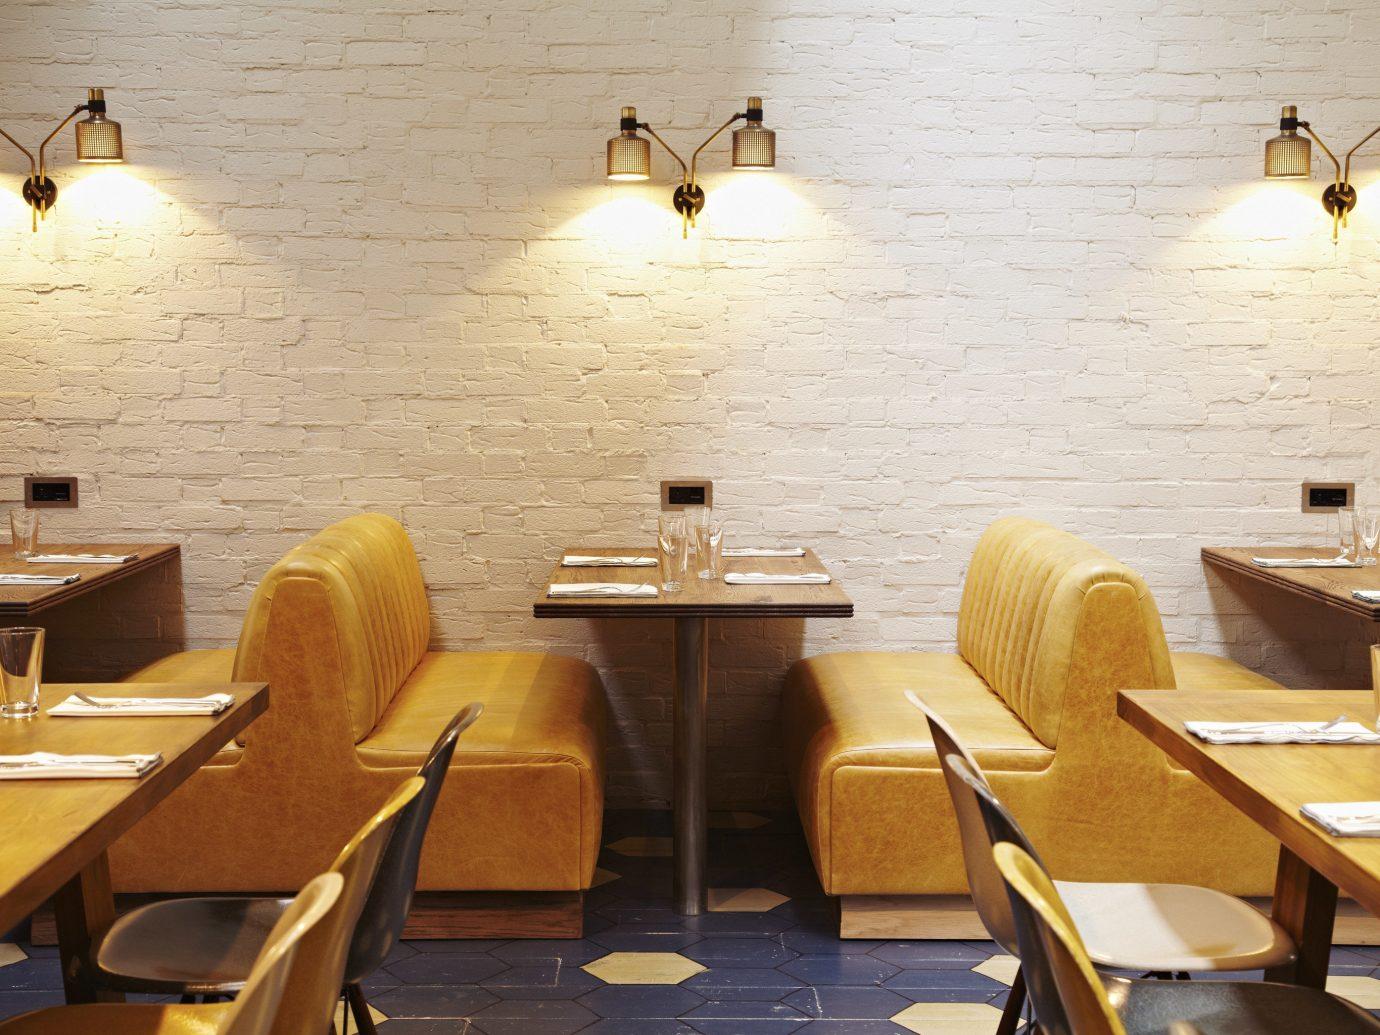 Budget Hotels London table room restaurant dining room wooden lighting interior design wood furniture